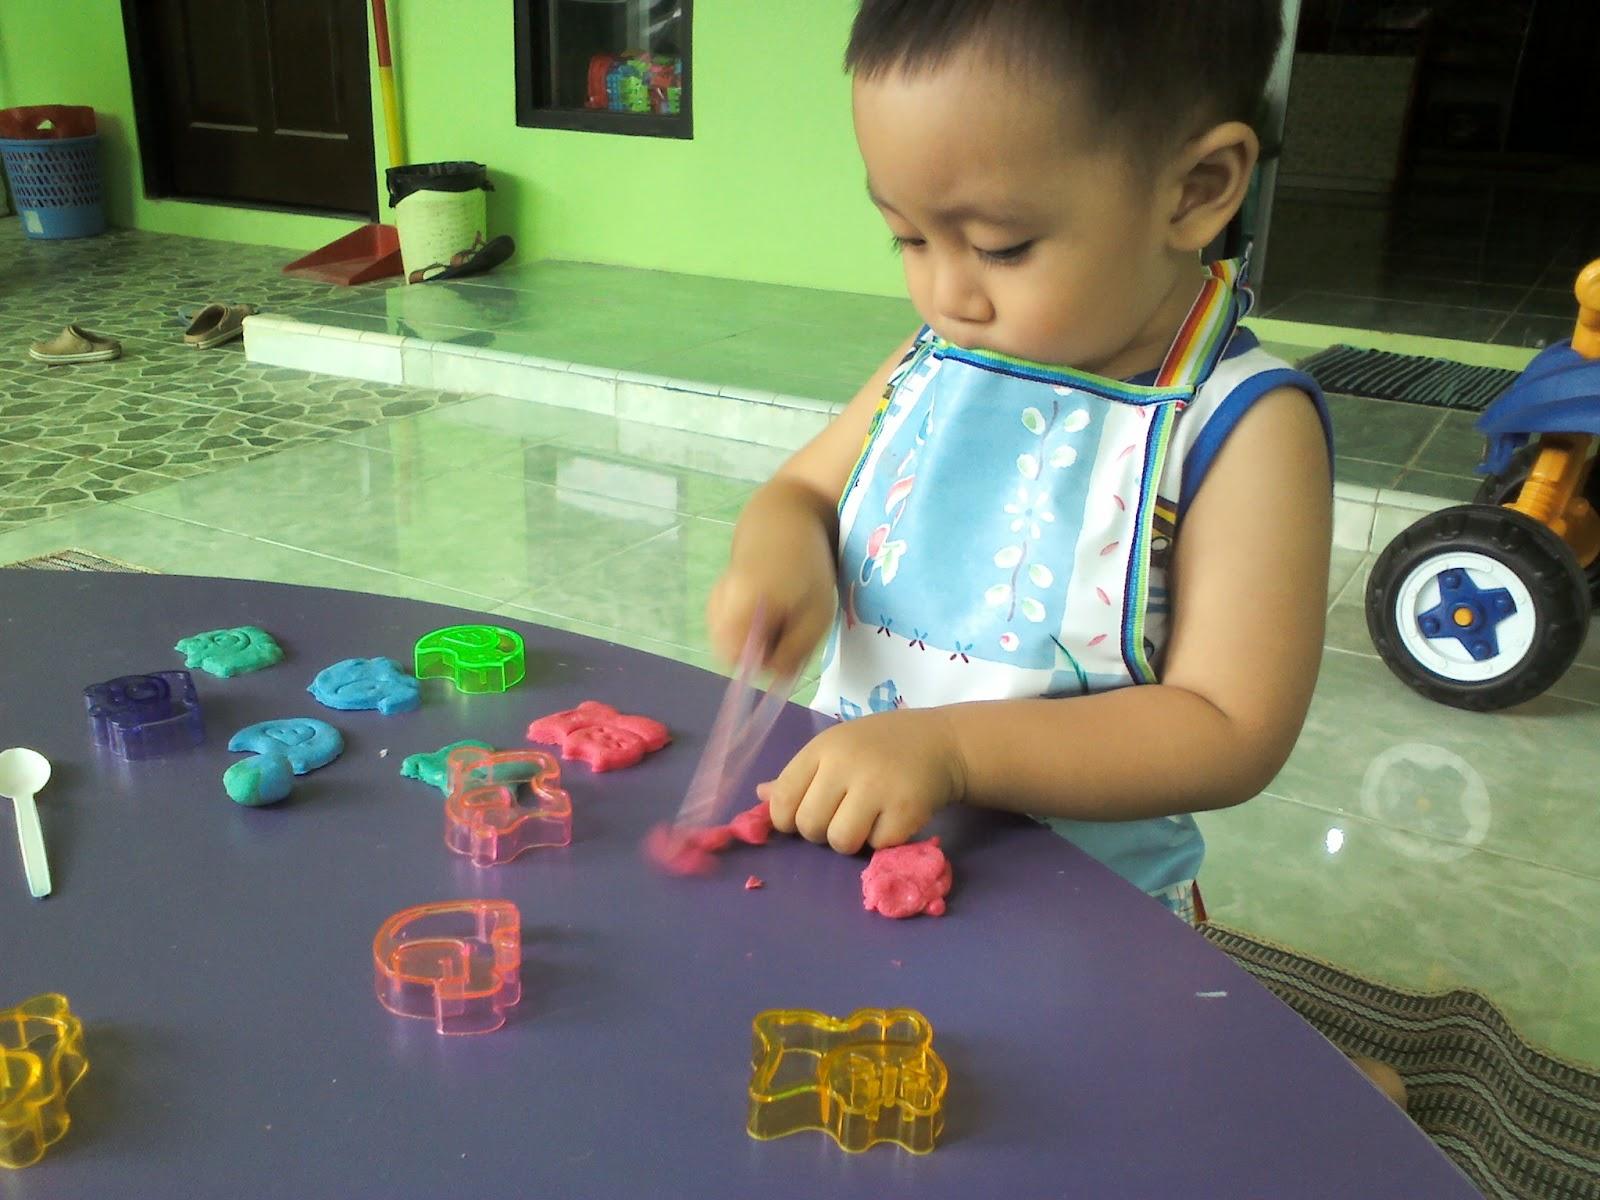 http://babykidszoom.blogspot.com/2015/03/gambar-anak-anak-bermain-7.html